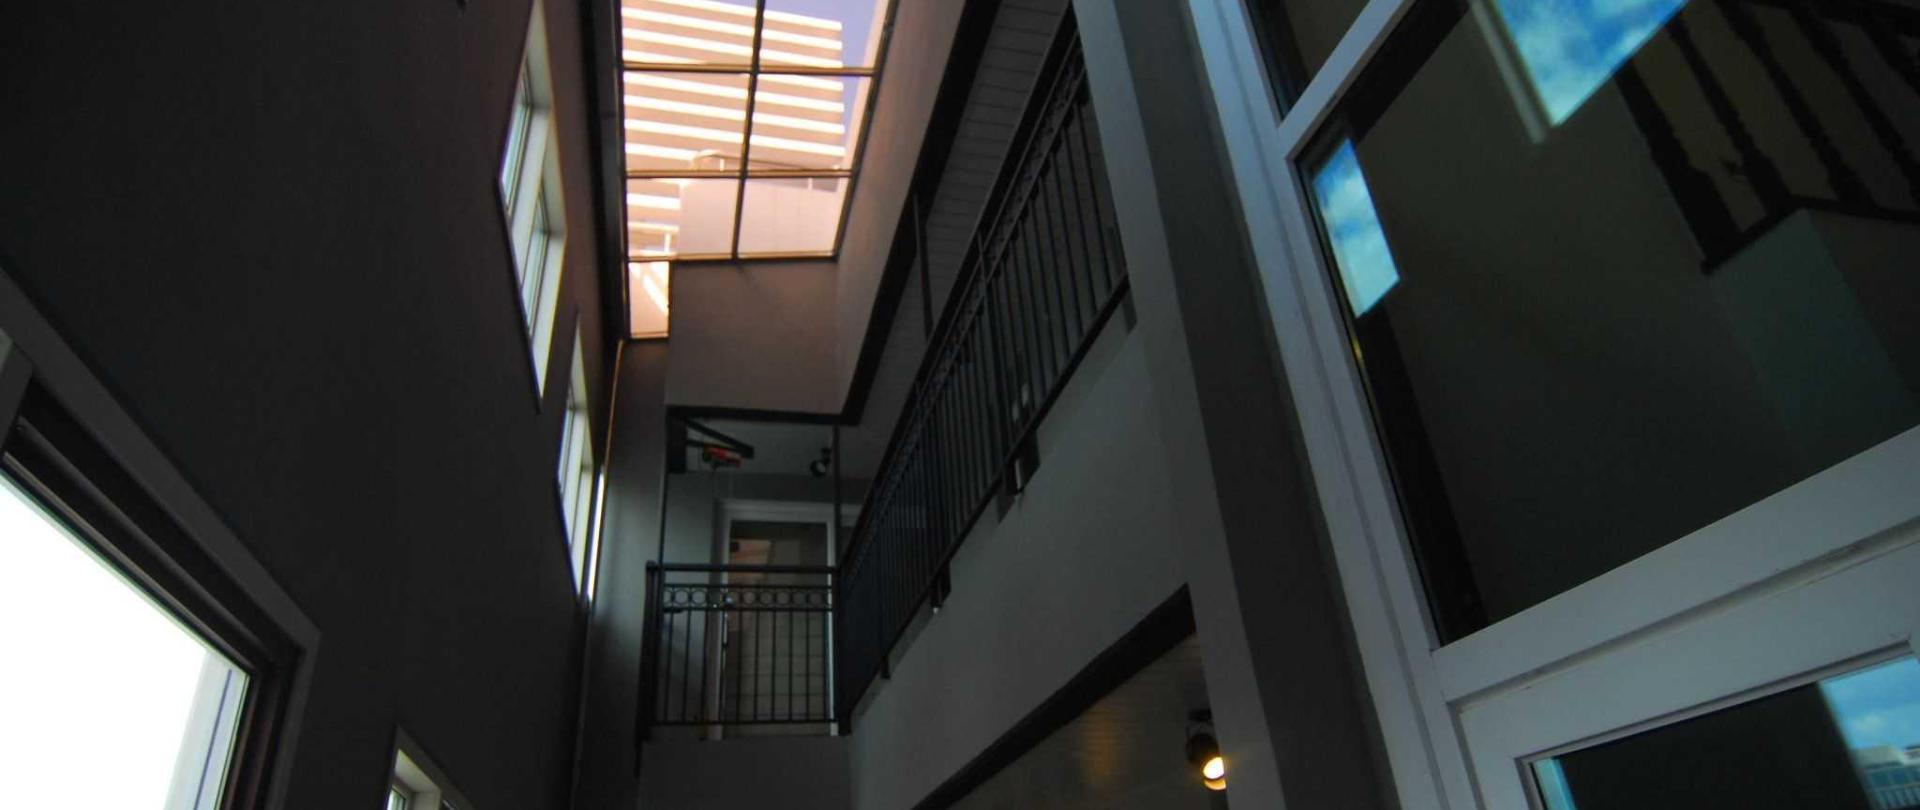 terrace4.JPG